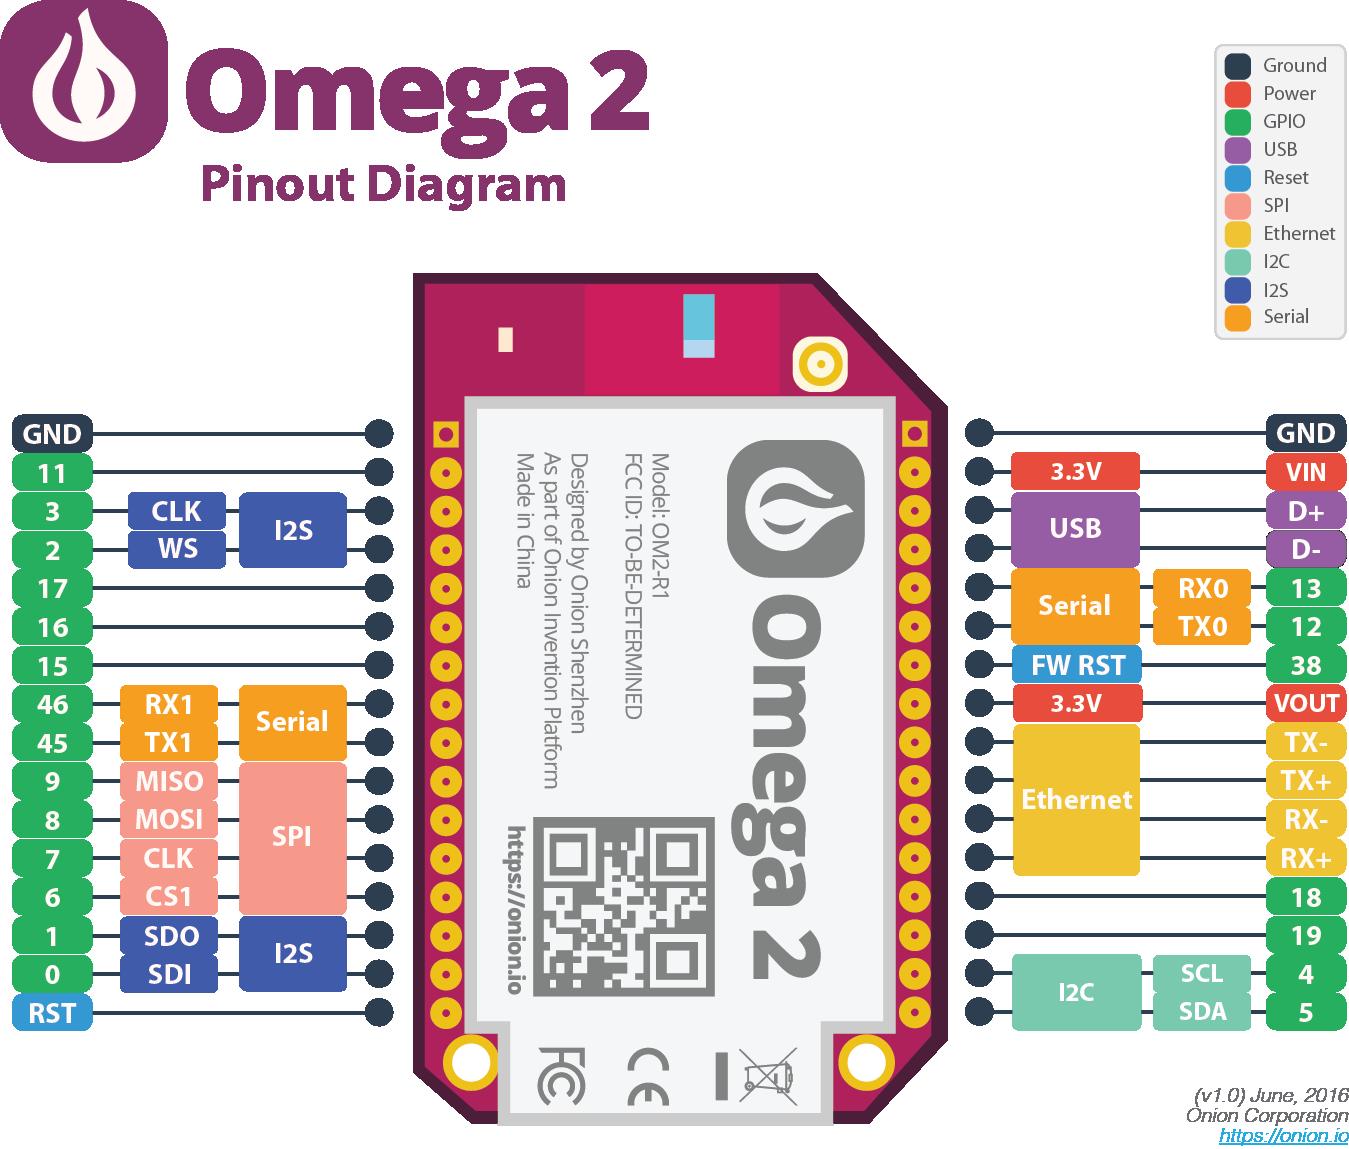 omega2-pinout-diagram | Tech | Linux, Wifi, Electronics gadgets